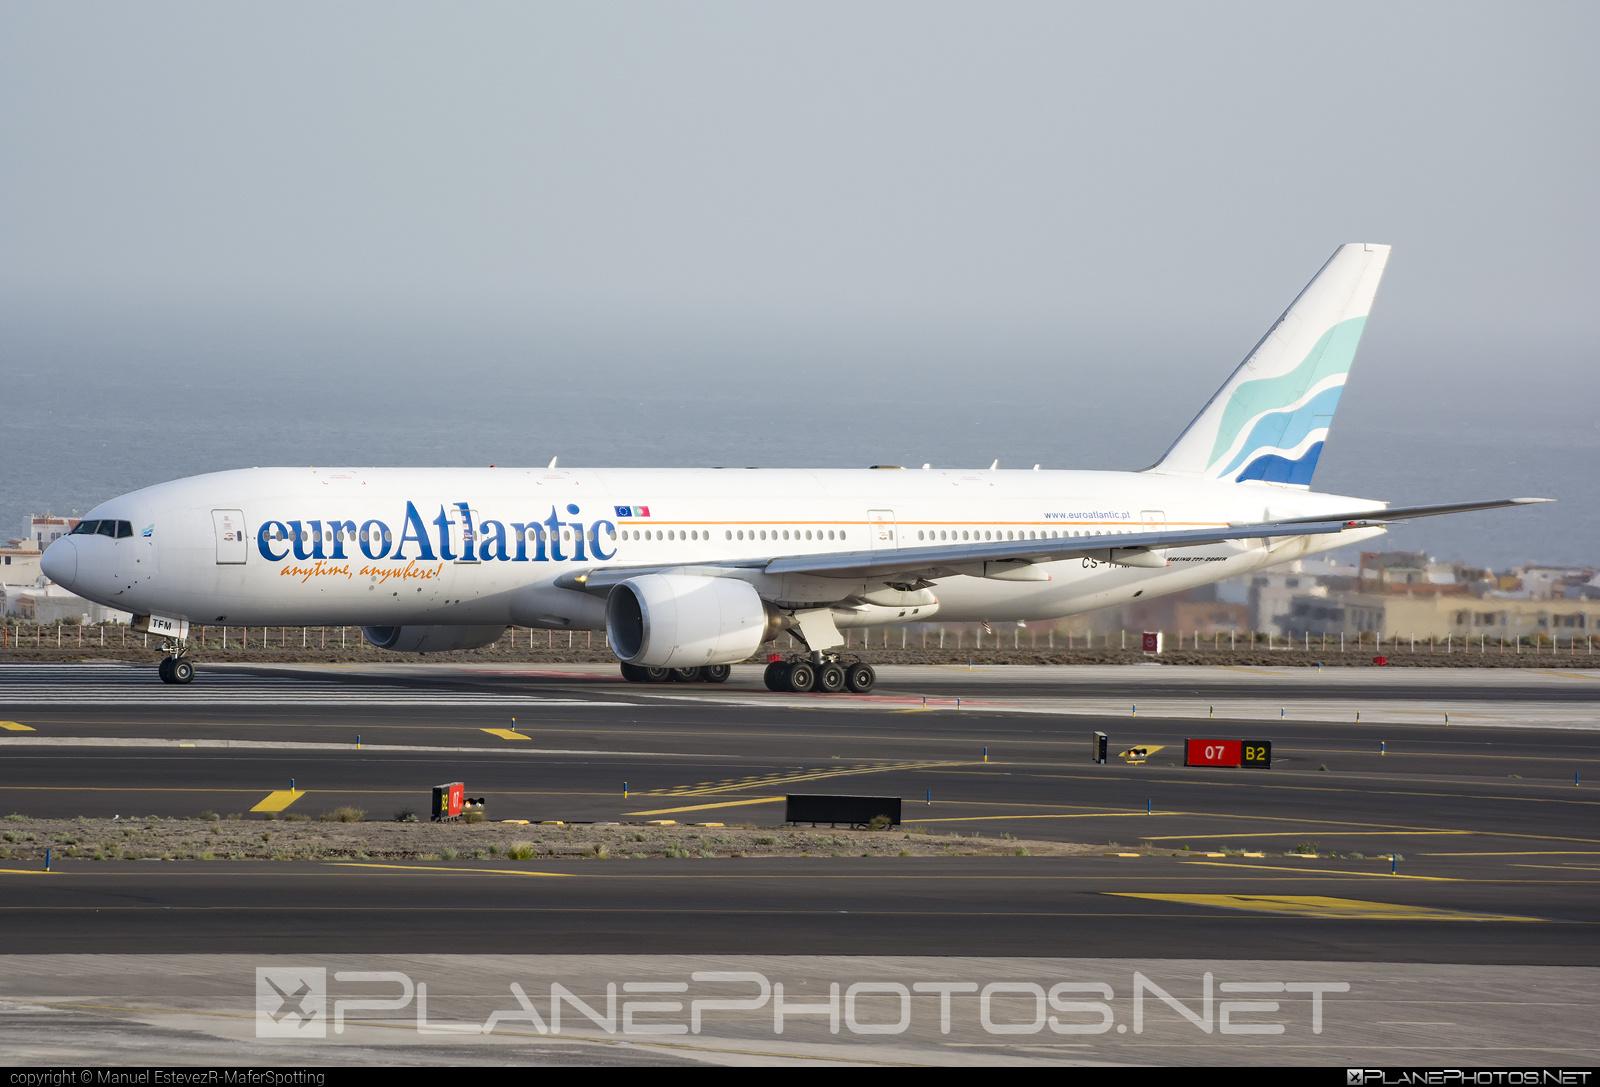 Boeing 777-200ER - CS-TFM operated by euroAtlantic Airways #b777 #b777er #boeing #boeing777 #euroatlantic #euroatlanticairways #tripleseven